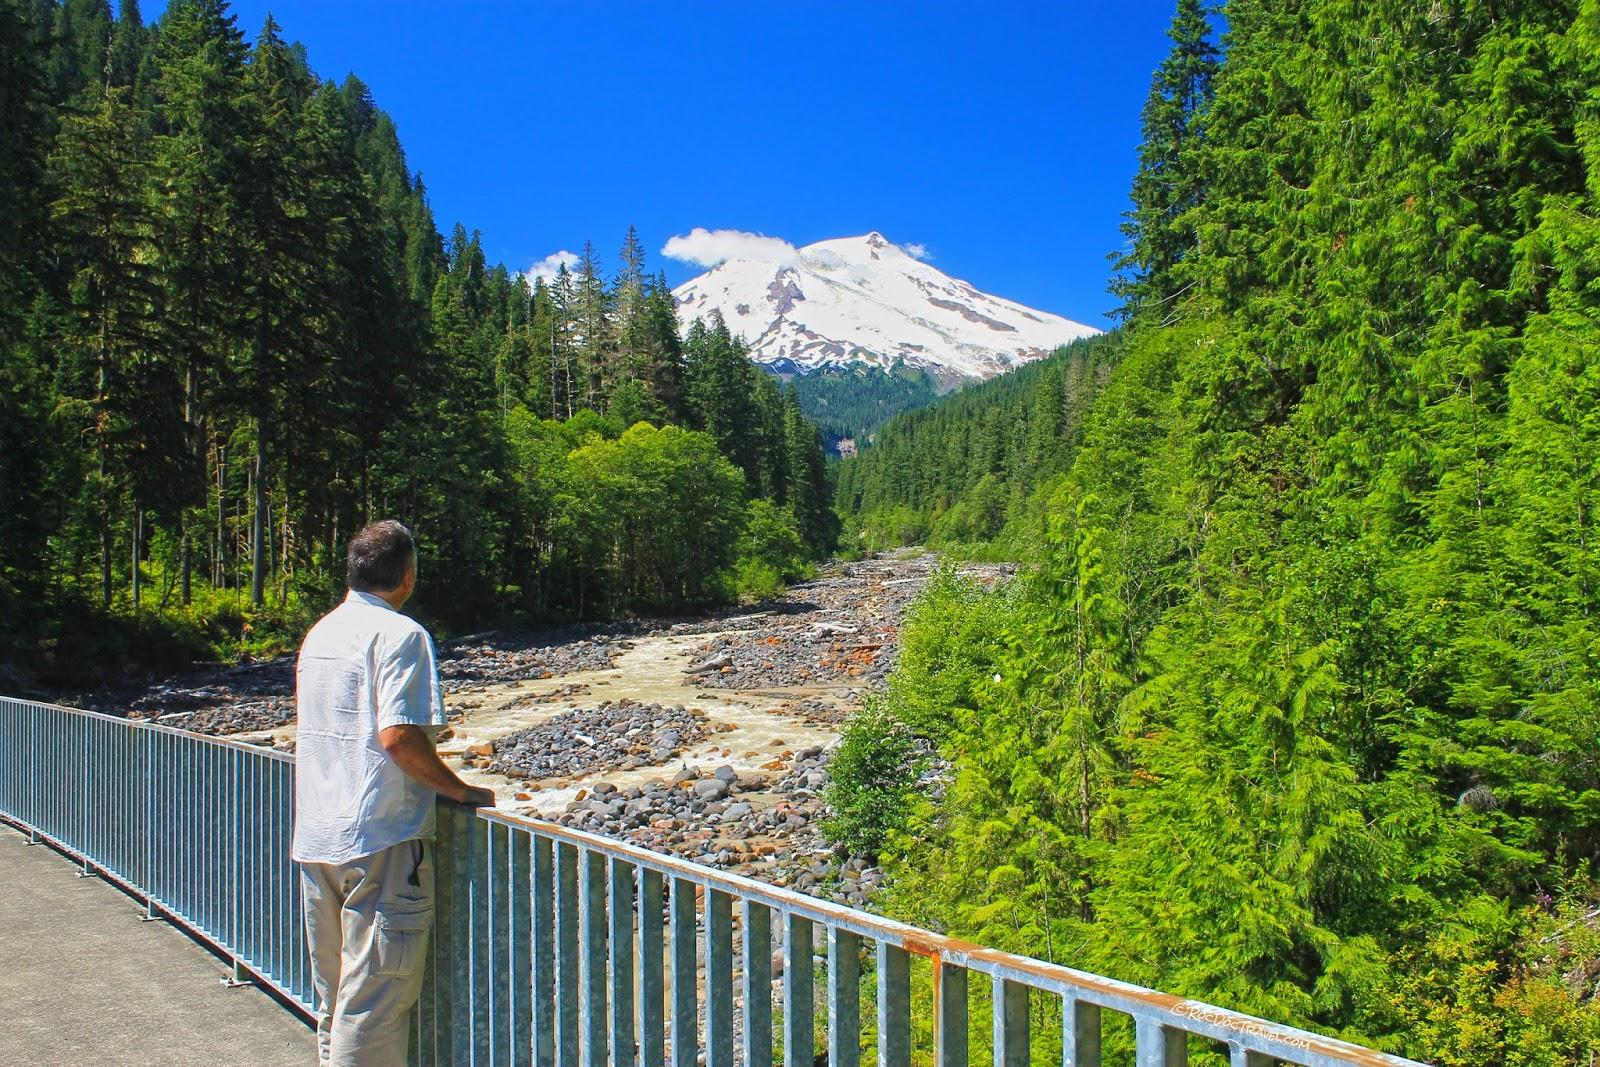 north Cascades National Park Oso landslide Mount Baker volcano glacier lake Washington pass copyright rocdoctravel.com